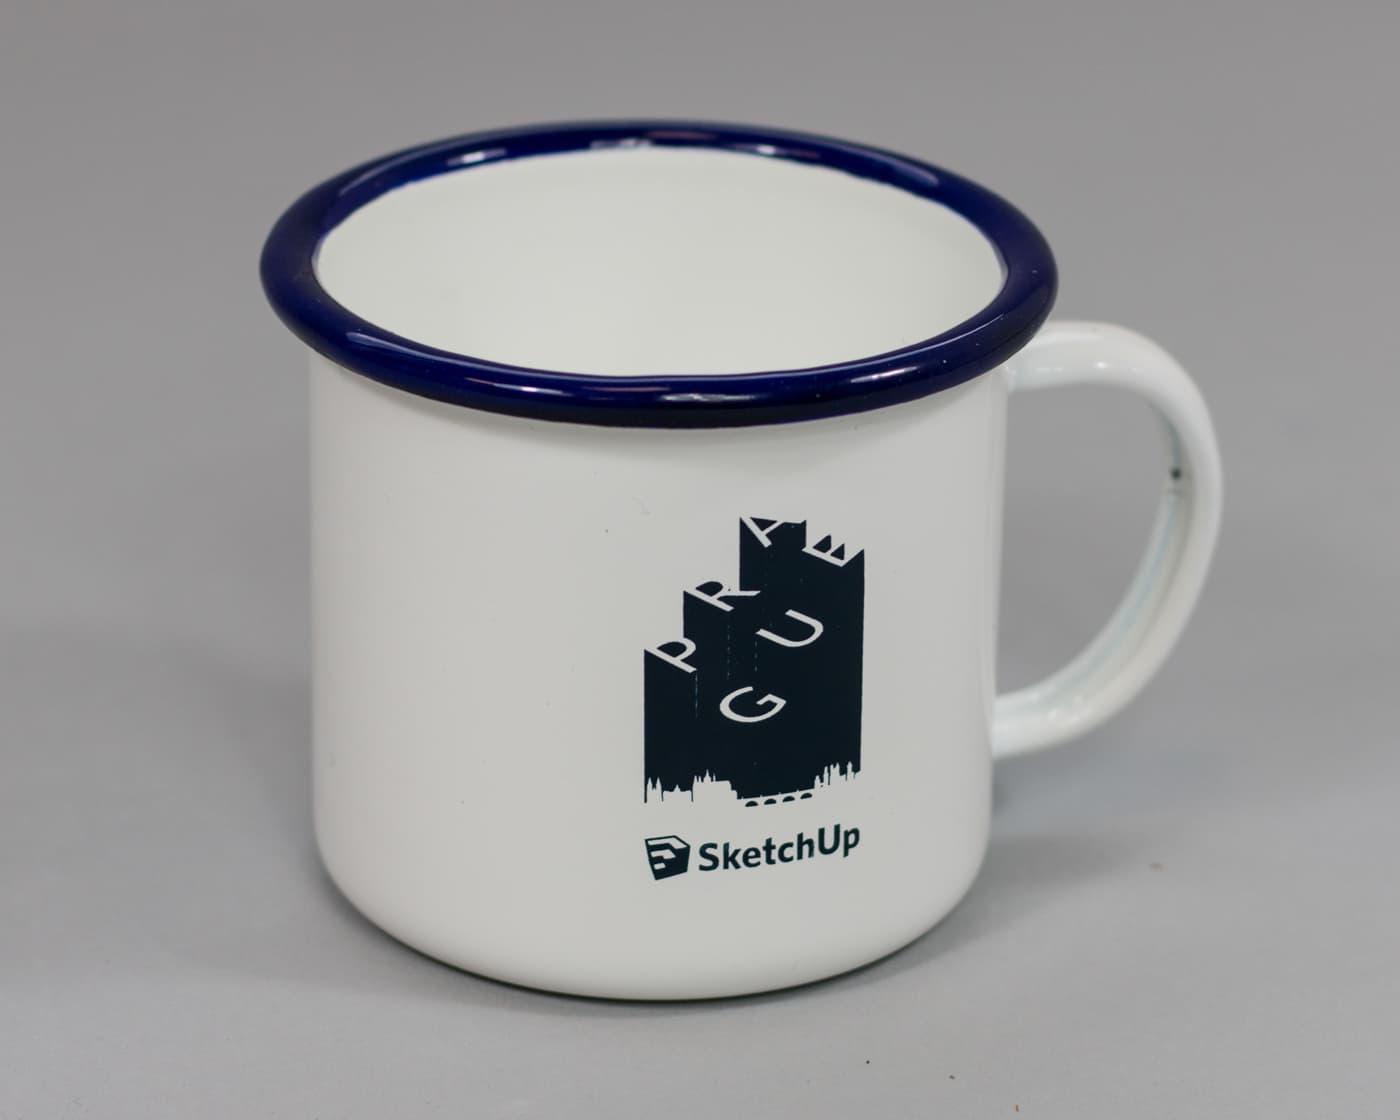 Enamel Printed Camping Mugs - SketchUp-10